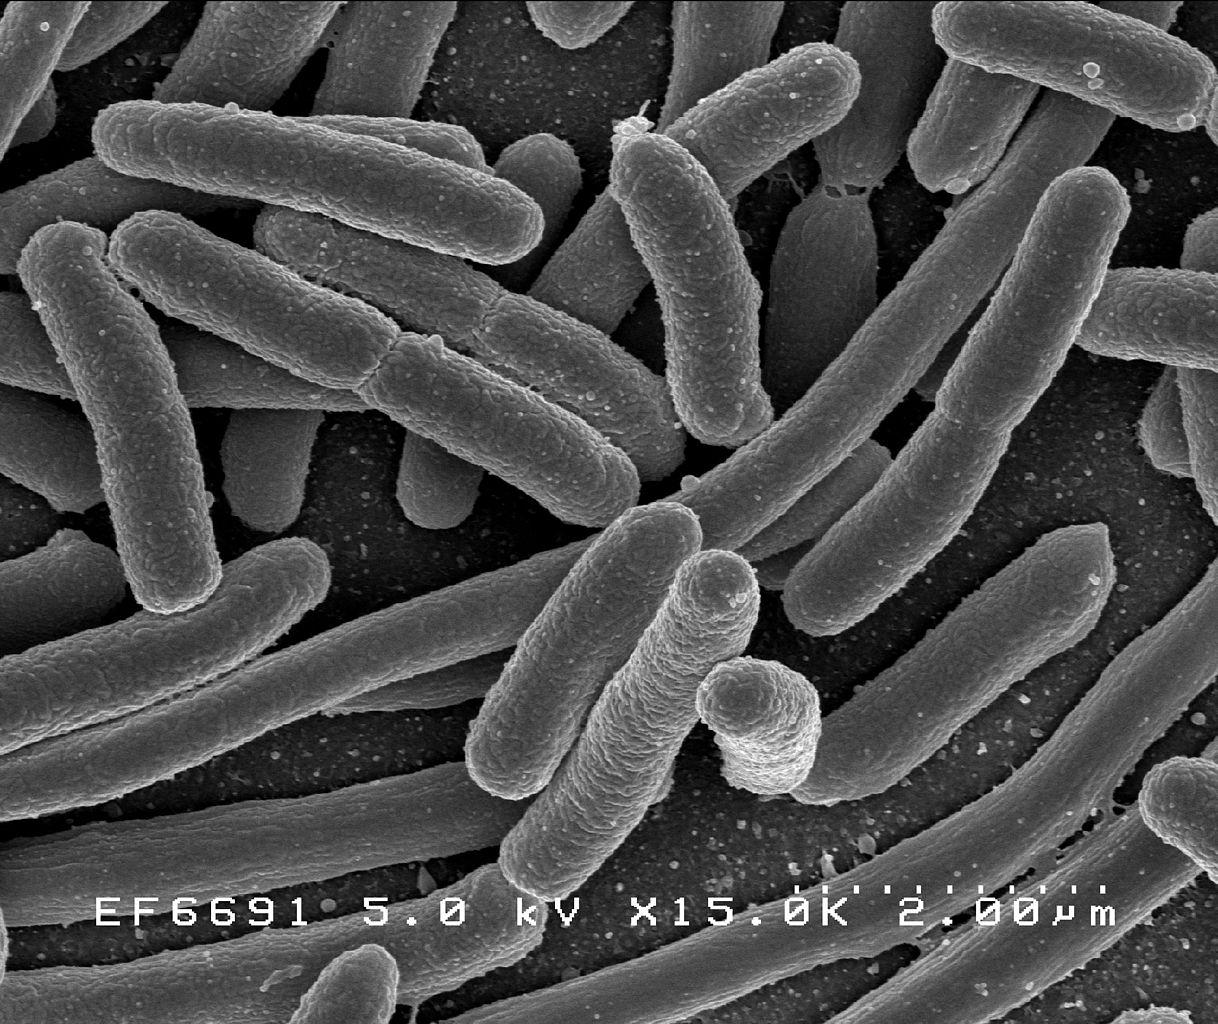 E-coli bacteria - Image Credit:  NIAD via WikimediaCommons